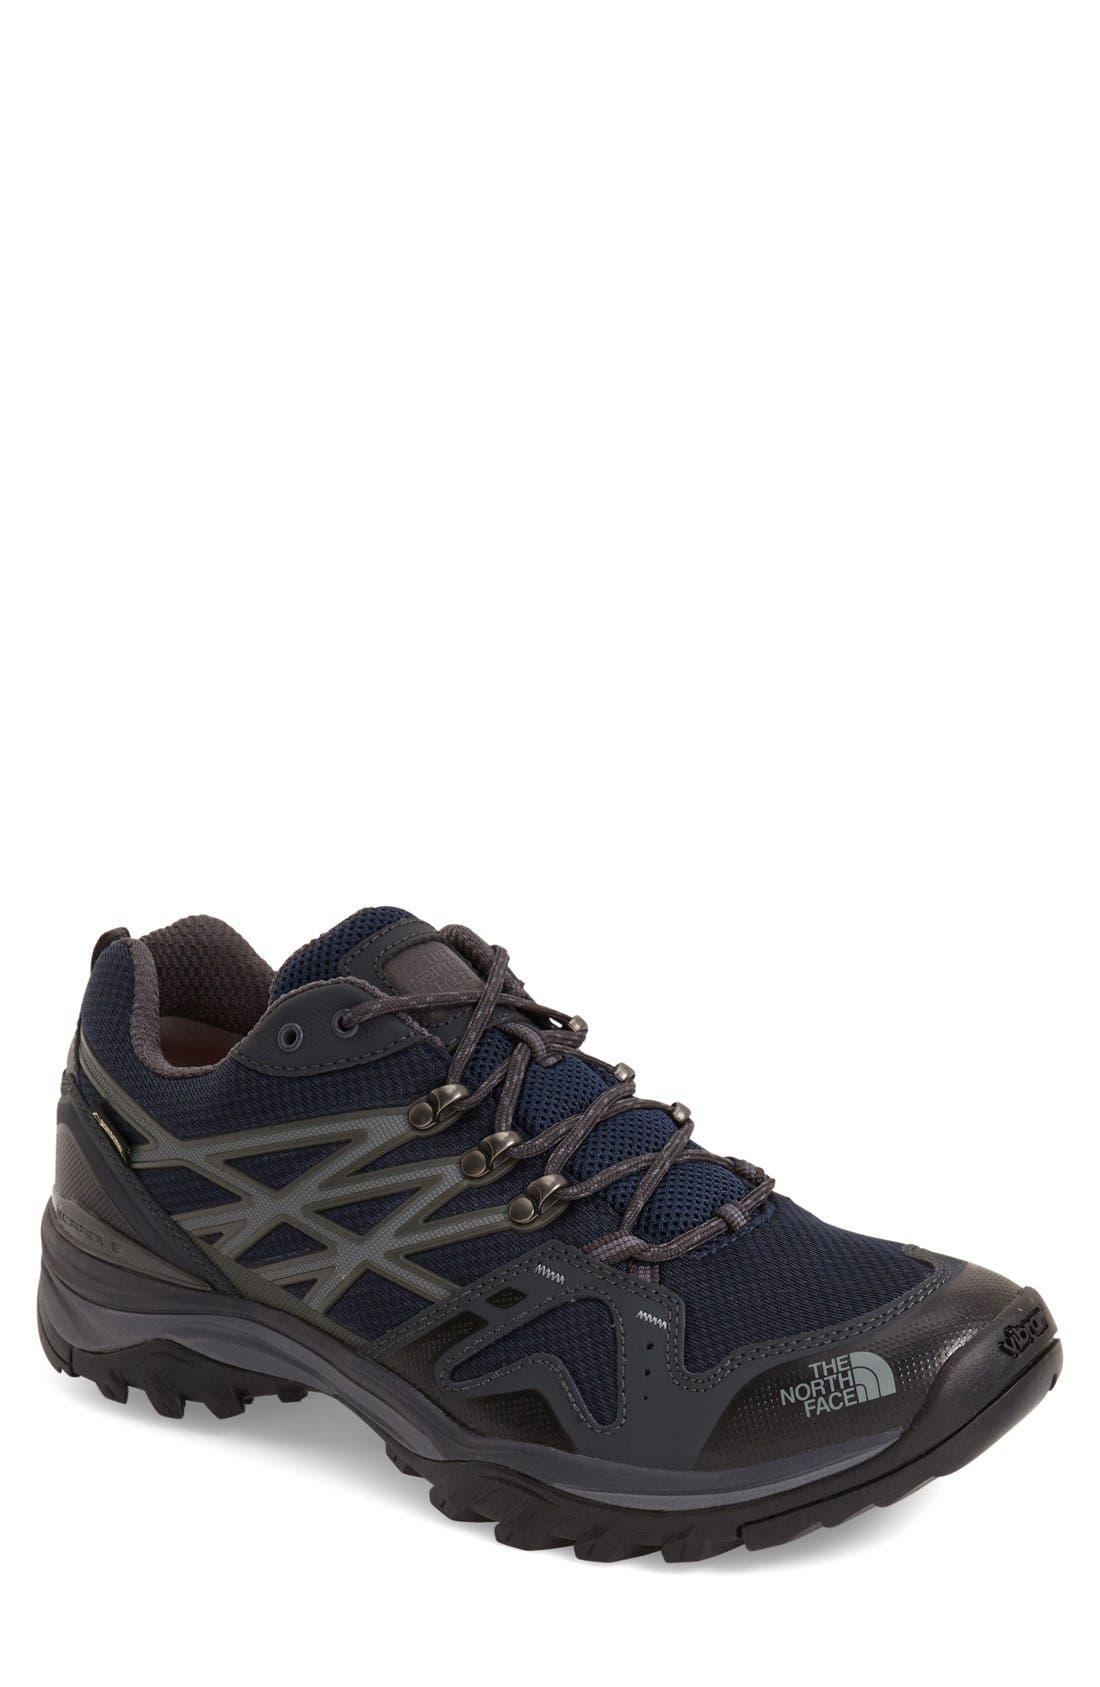 'Hedgehog Fastpack' Gore-Tex<sup>®</sup> Waterproof Hiking Shoe,                             Main thumbnail 4, color,